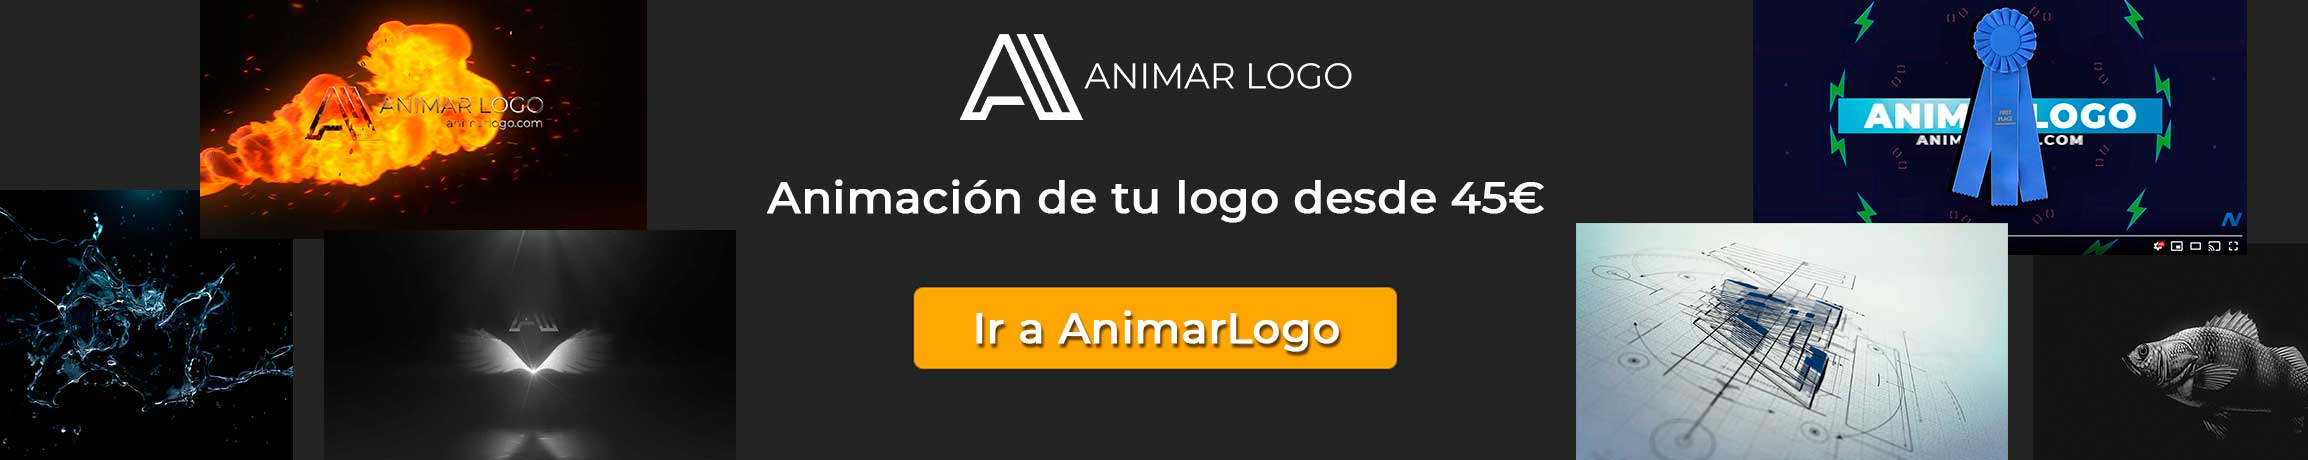 Banner-AnimarLogo-para-Descargas360-grande Calle de casas bajas